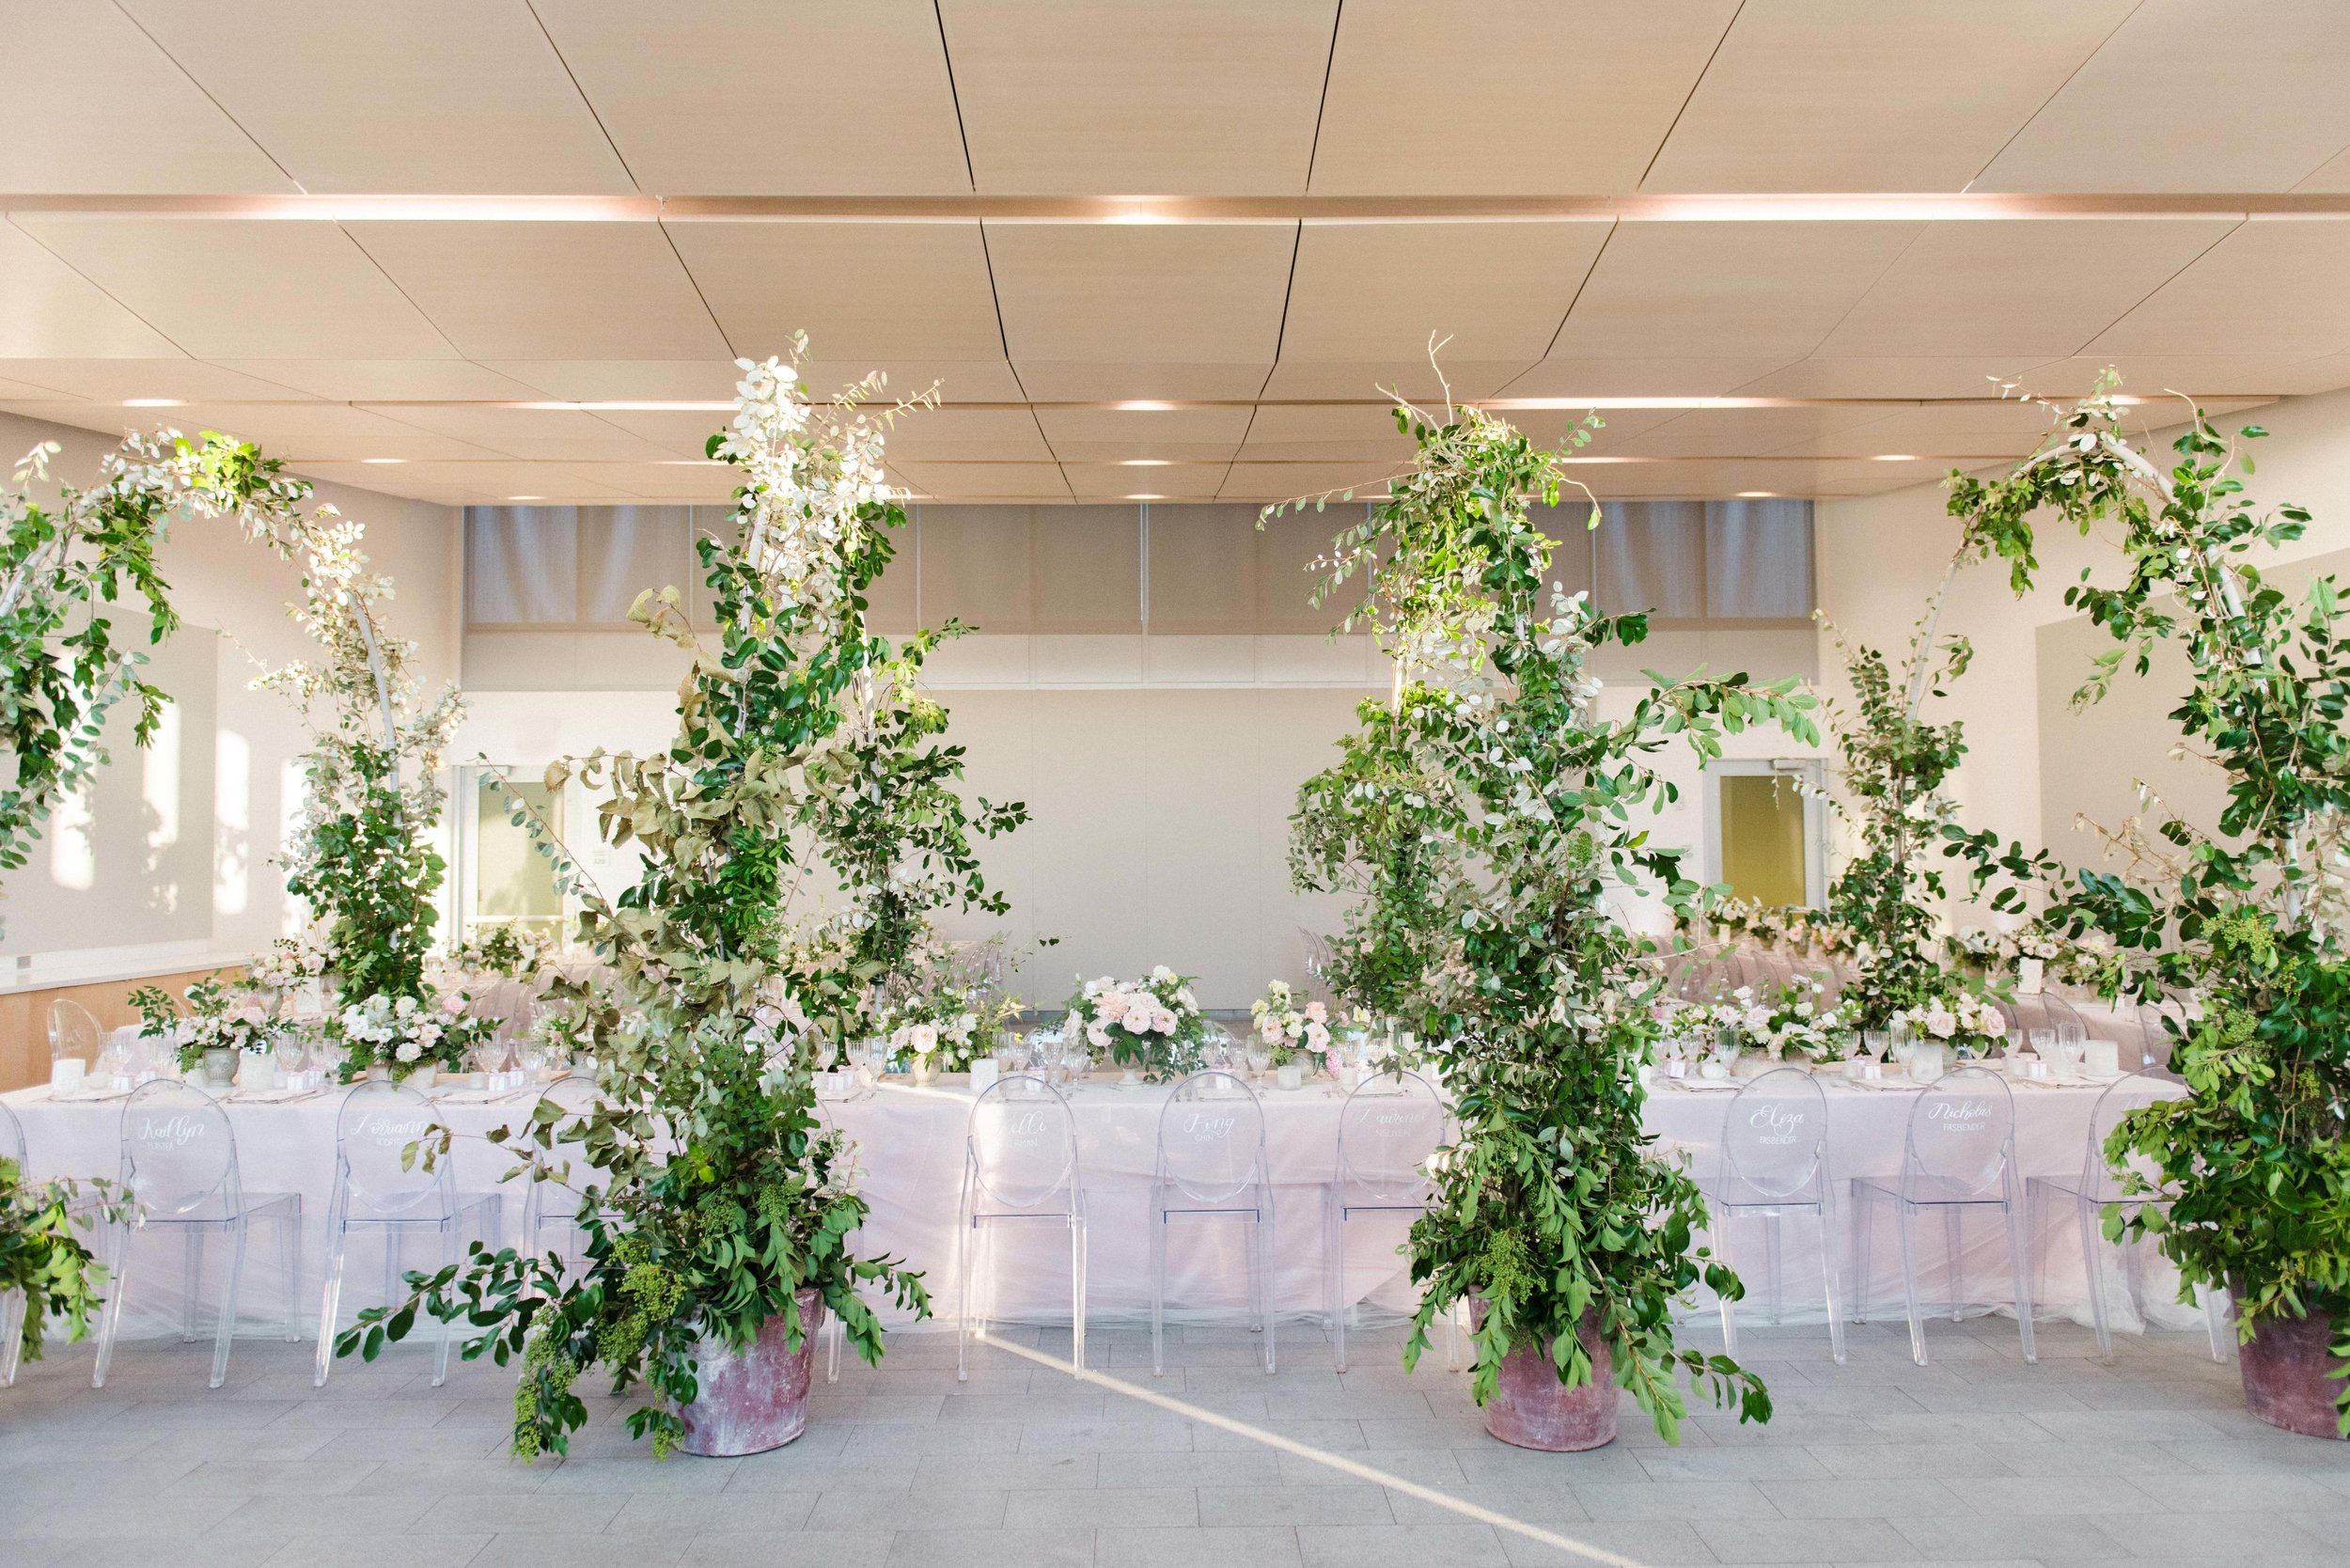 Martha-Stewart-Wedding-Dana-Fernandez-Photography-Josh-Texas-Film-Houston-Wedding-Fine-Art-Photographer-McGovern-Centennial-Gardens-Top-Best-44.jpg